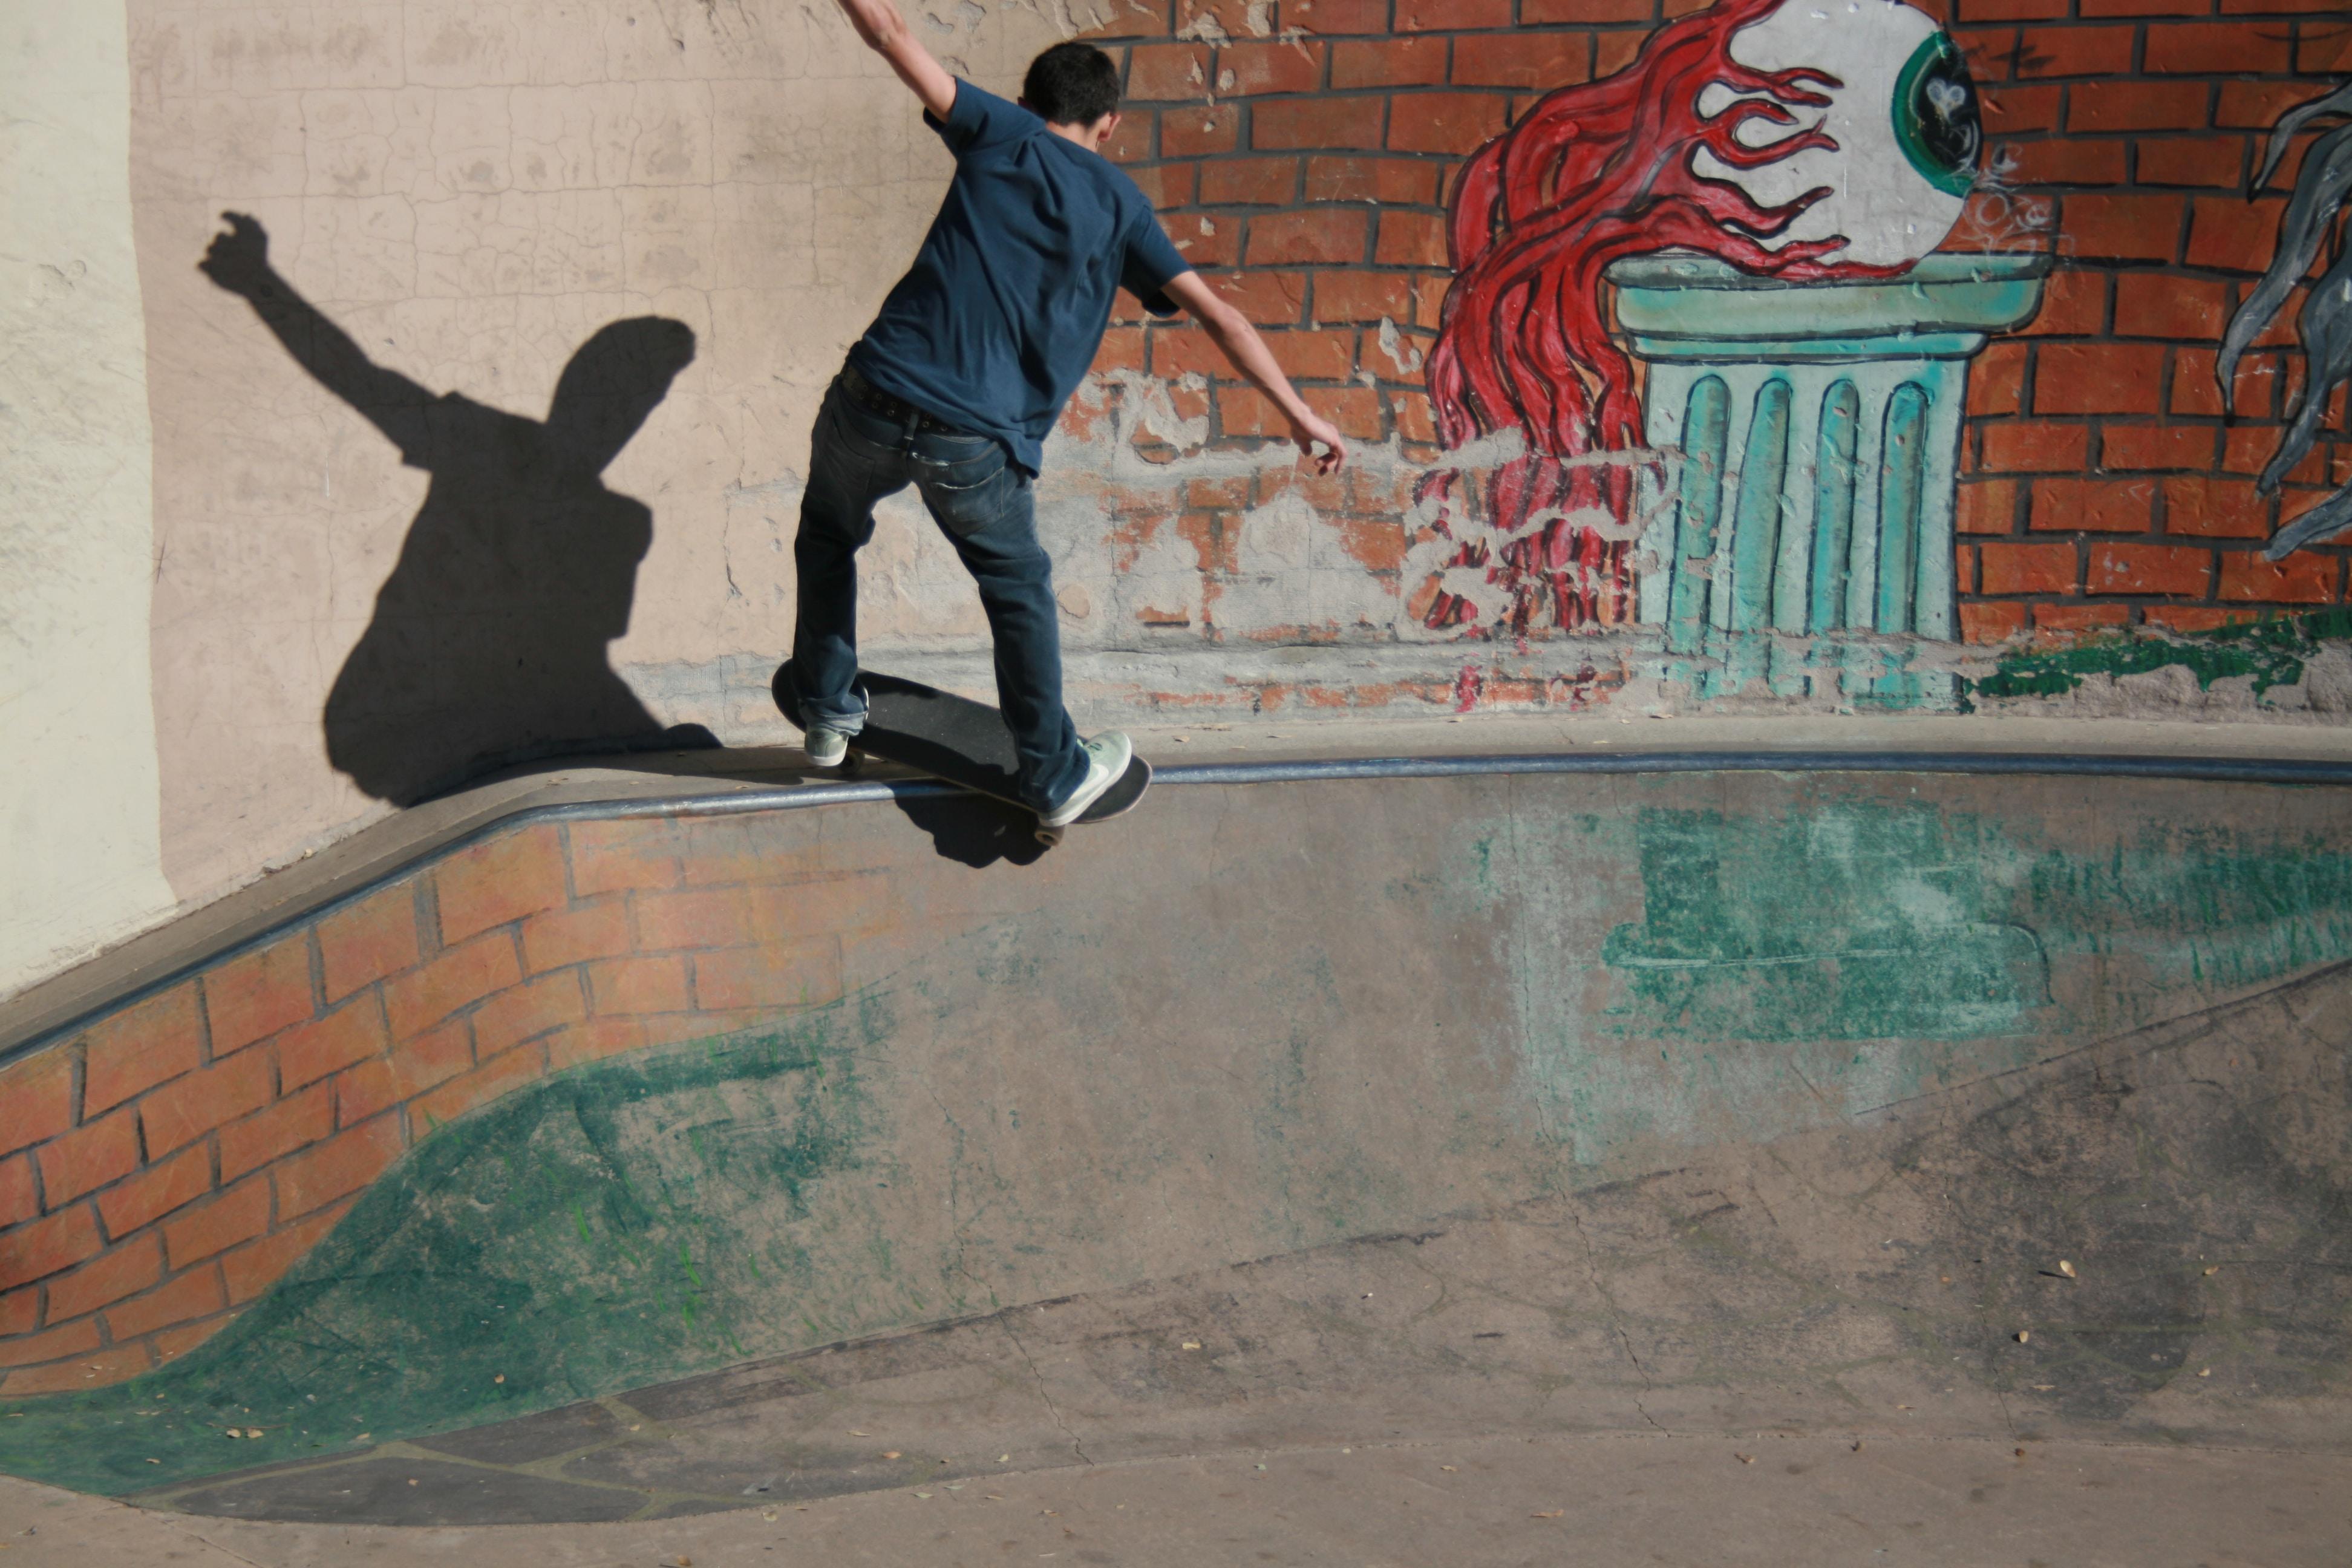 Skateboarder grinding on small ramp near eyeball graffiti at American River Canyon Overlook Park